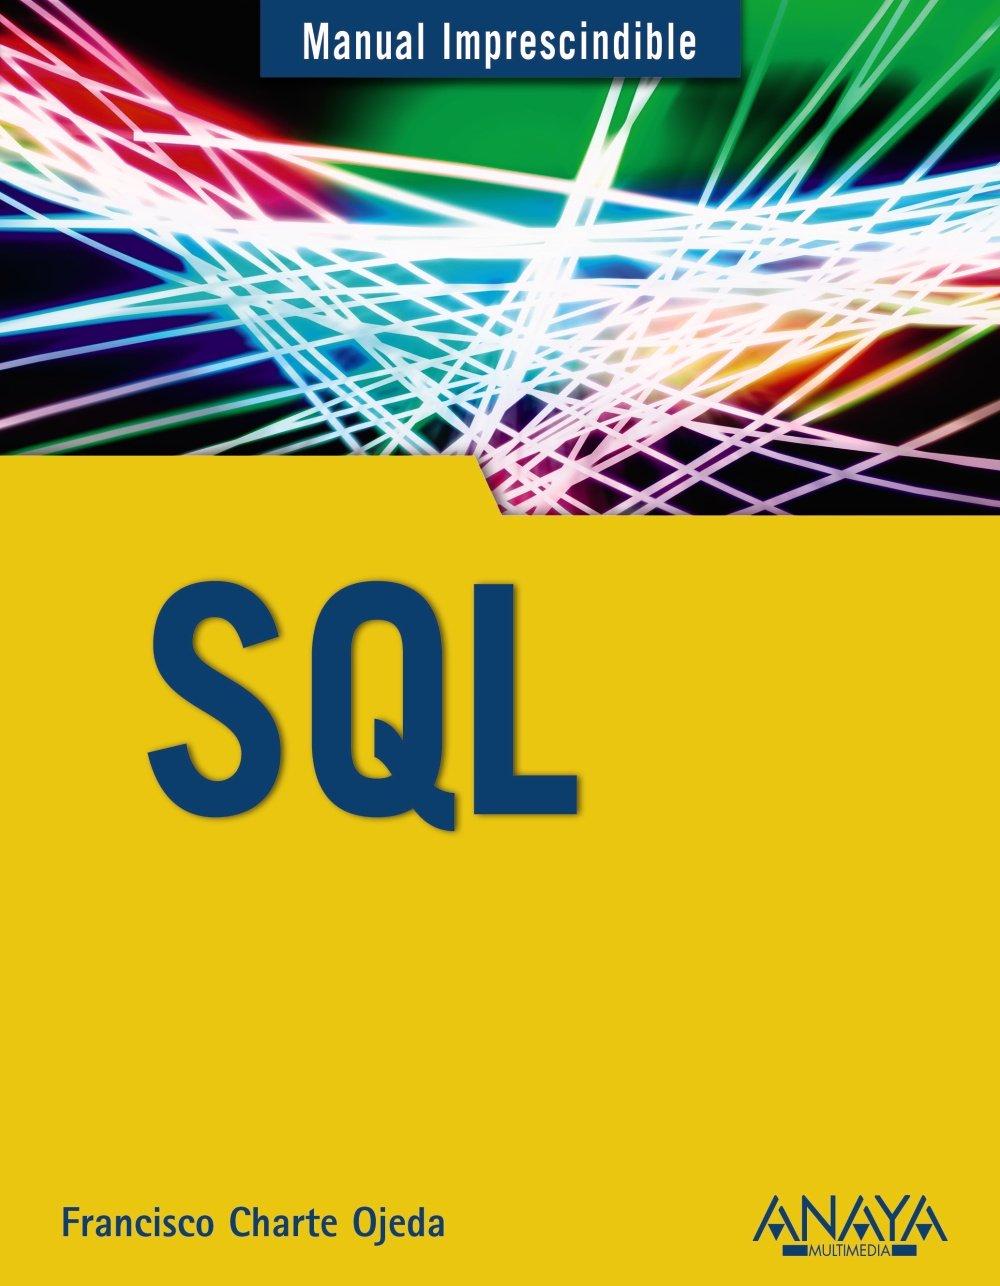 SQL (Manuales Imprescindibles) Tapa blanda – 11 sep 2014 Francisco Charte ANAYA MULTIMEDIA 8441536090 Computer Science